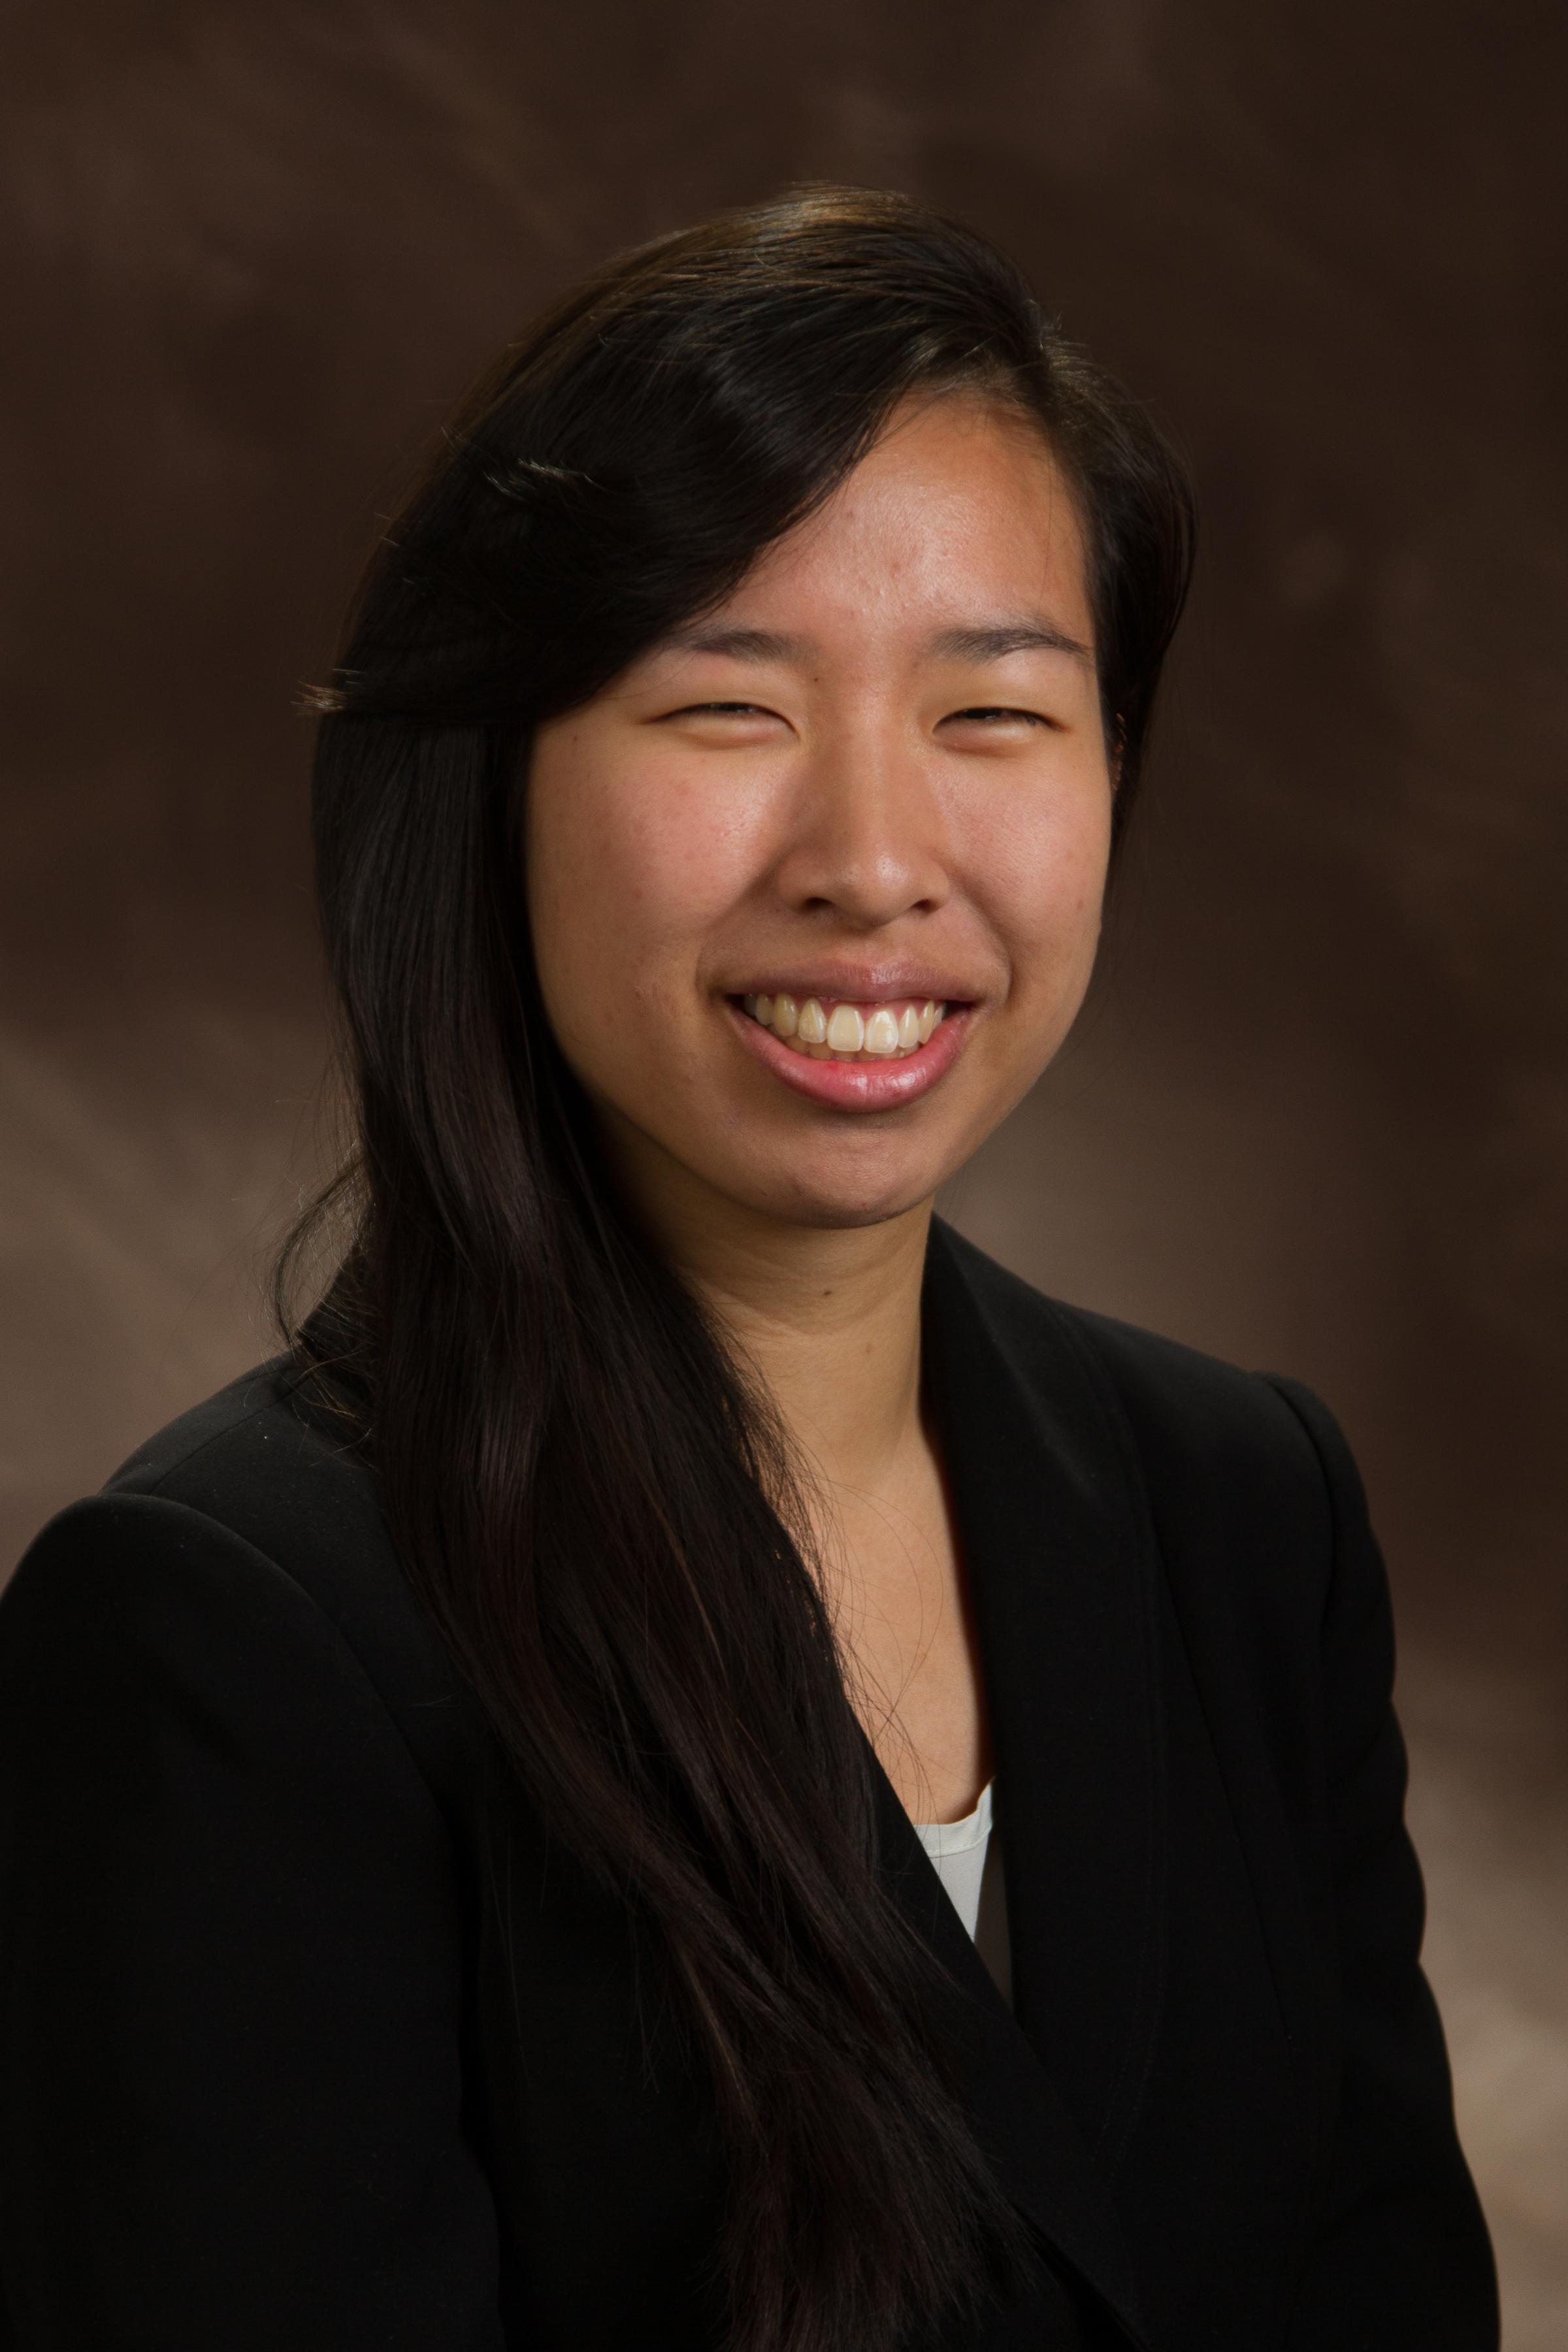 Nth Scholar Dana Sheng  -Georgetown University School of Medicine  Preceptor Dr. William Long - Private Practice  Los Angeles, CA